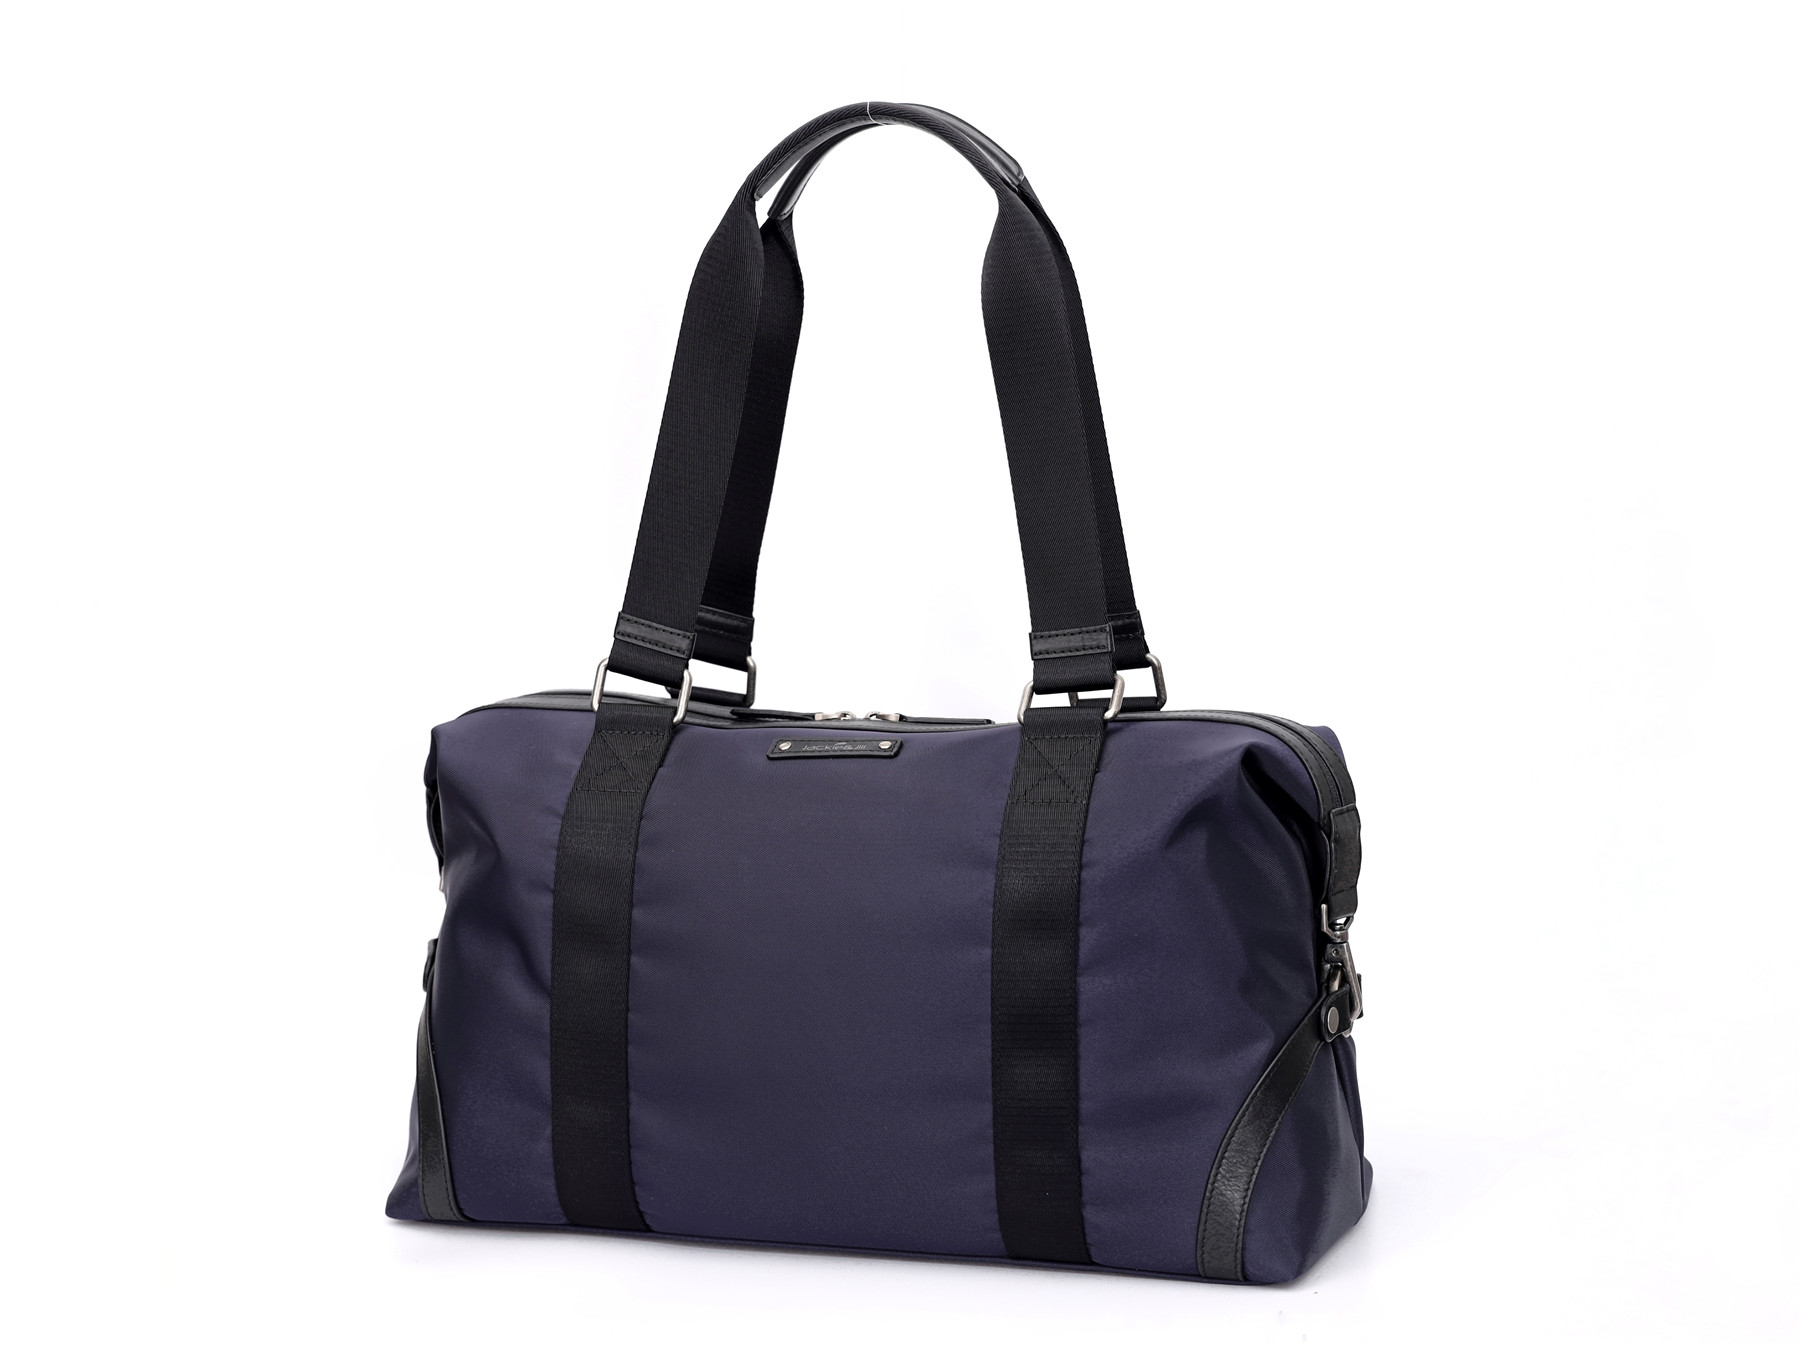 GF bags-Oem Mens Overnight Bag Manufacturer   Duffle